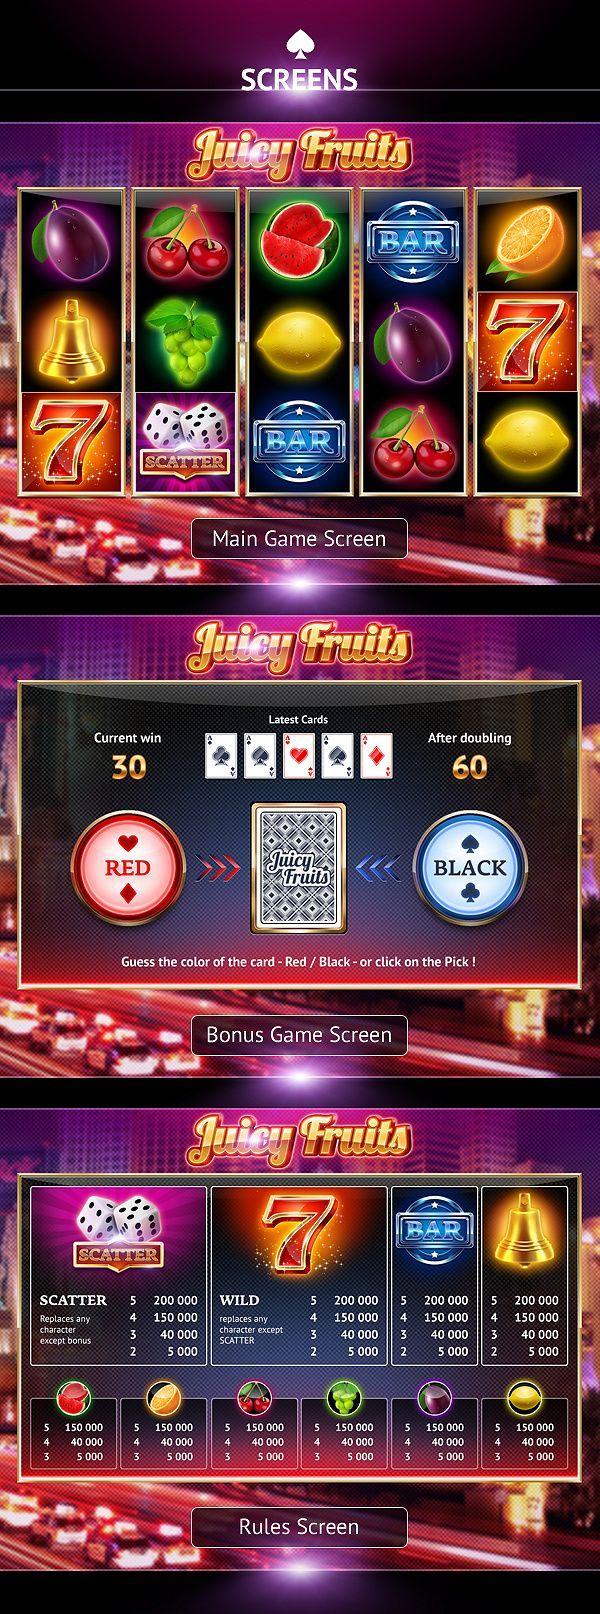 Win river casino reopening